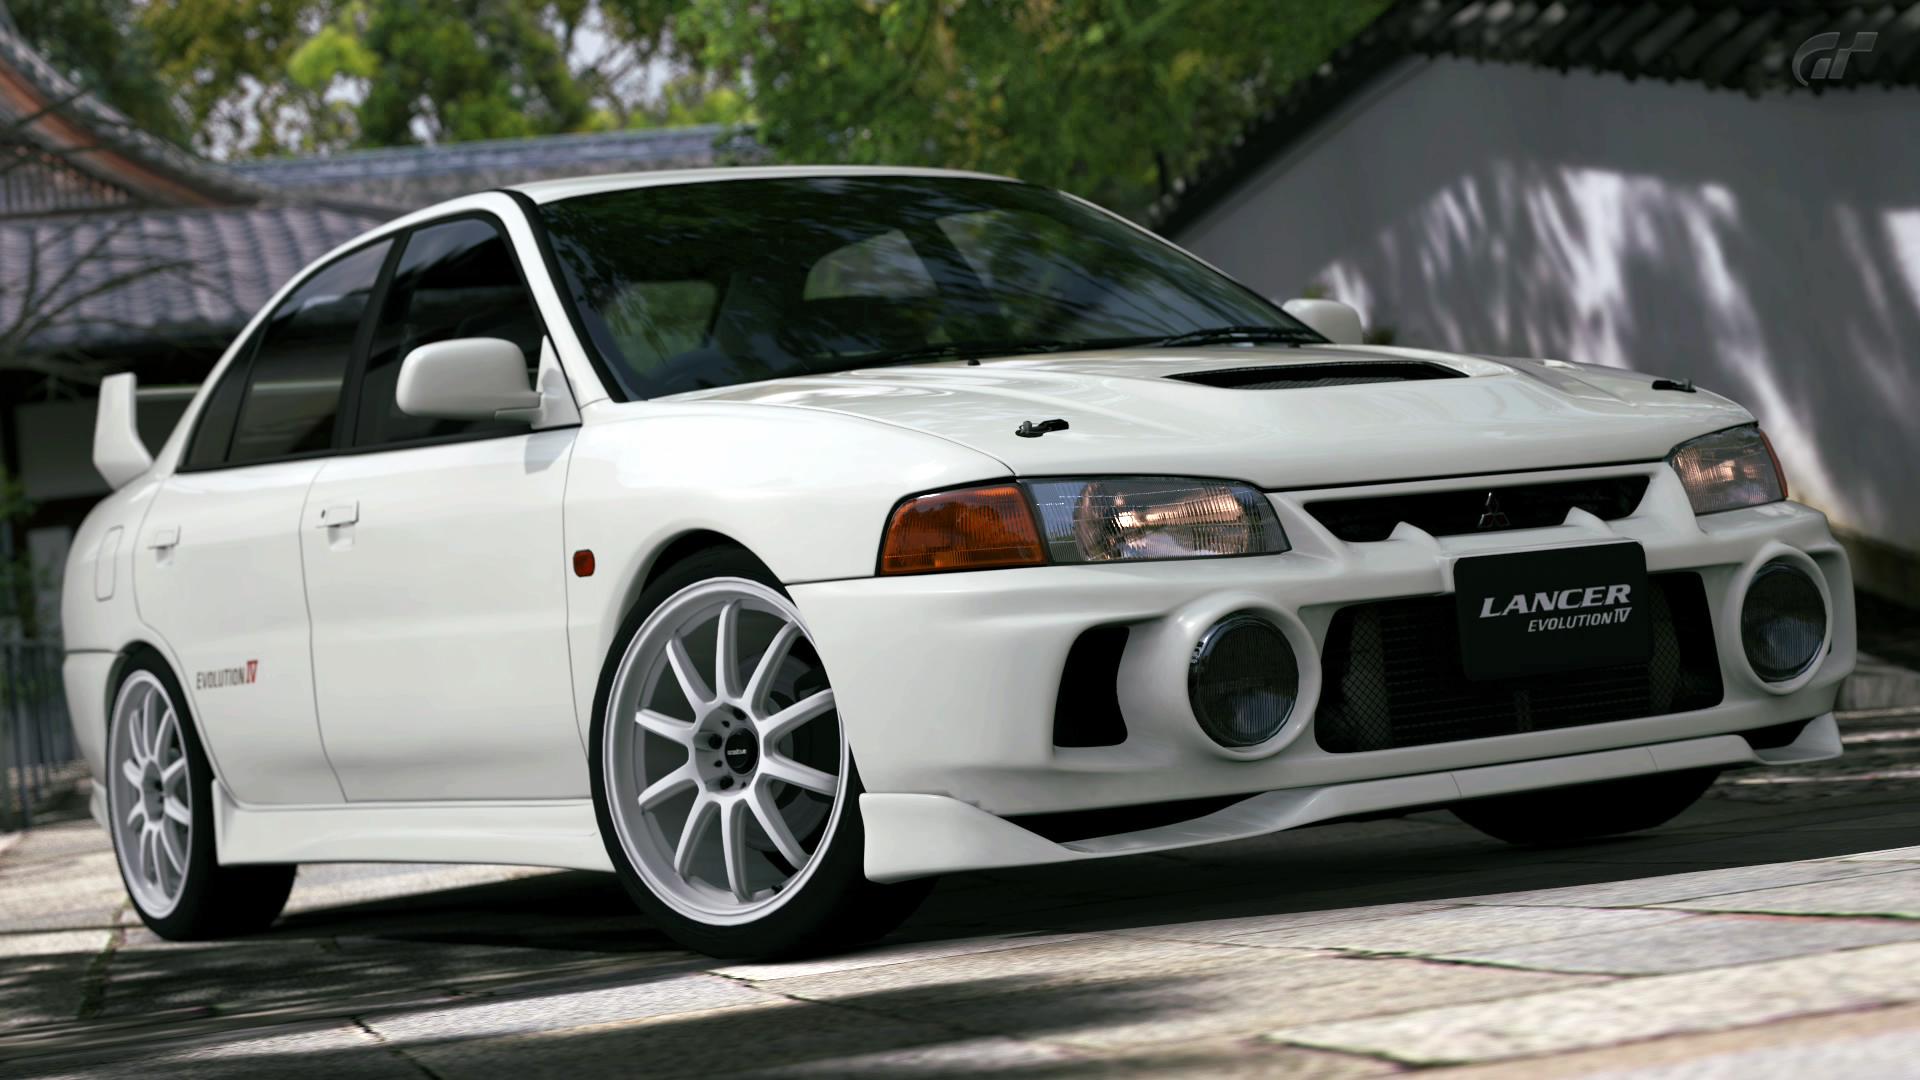 1996 Mitsubishi Lancer Evolution Iv Gt5 By Vertualissimo